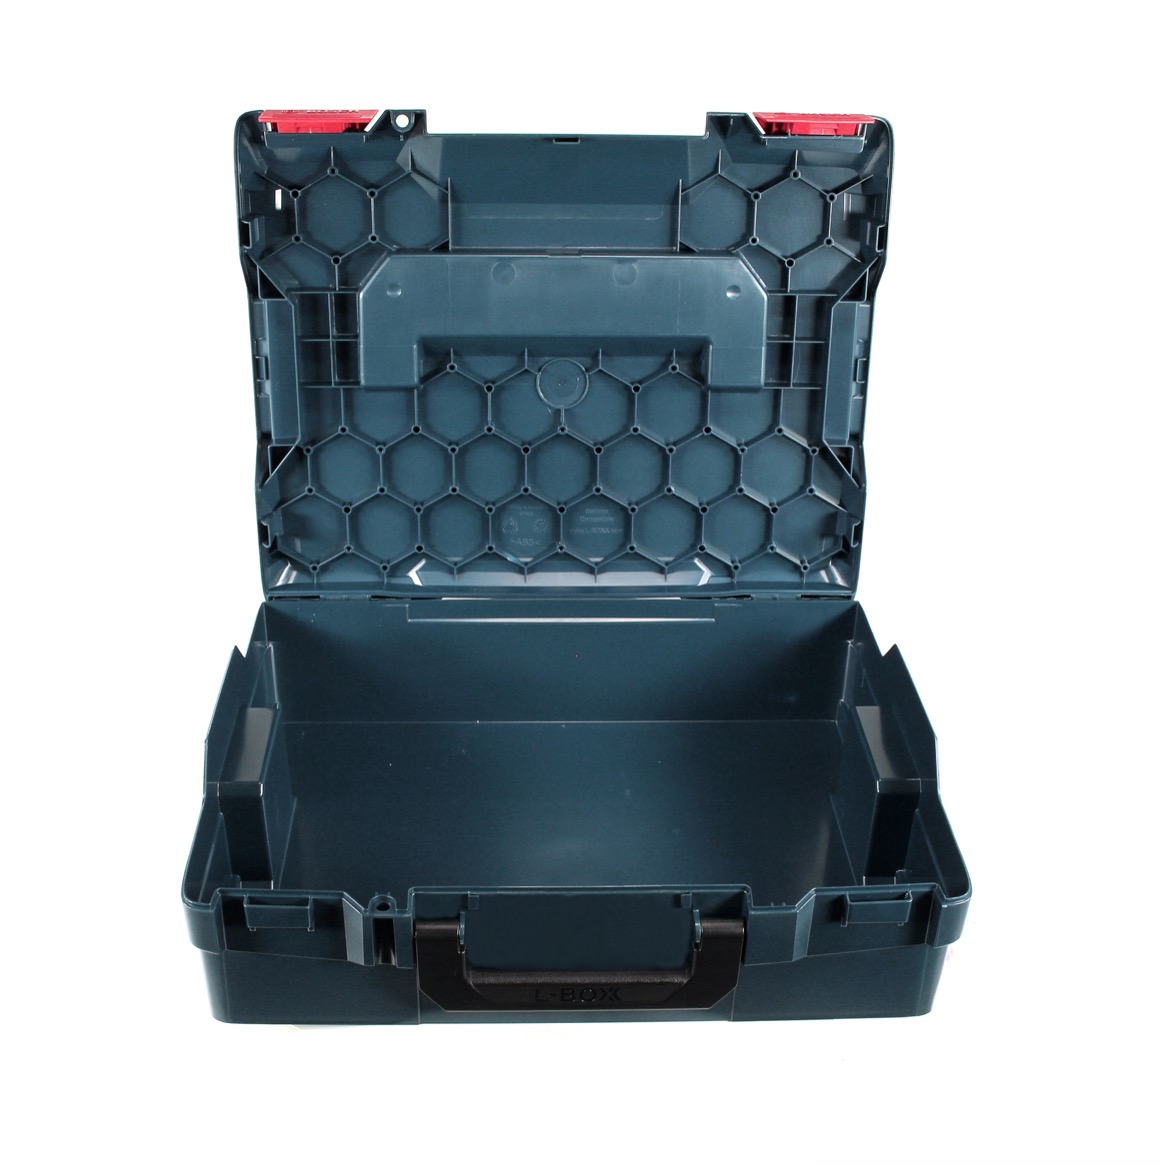 bosch l boxx lb4 sortimo box 136 werkzeugkoffer neues. Black Bedroom Furniture Sets. Home Design Ideas